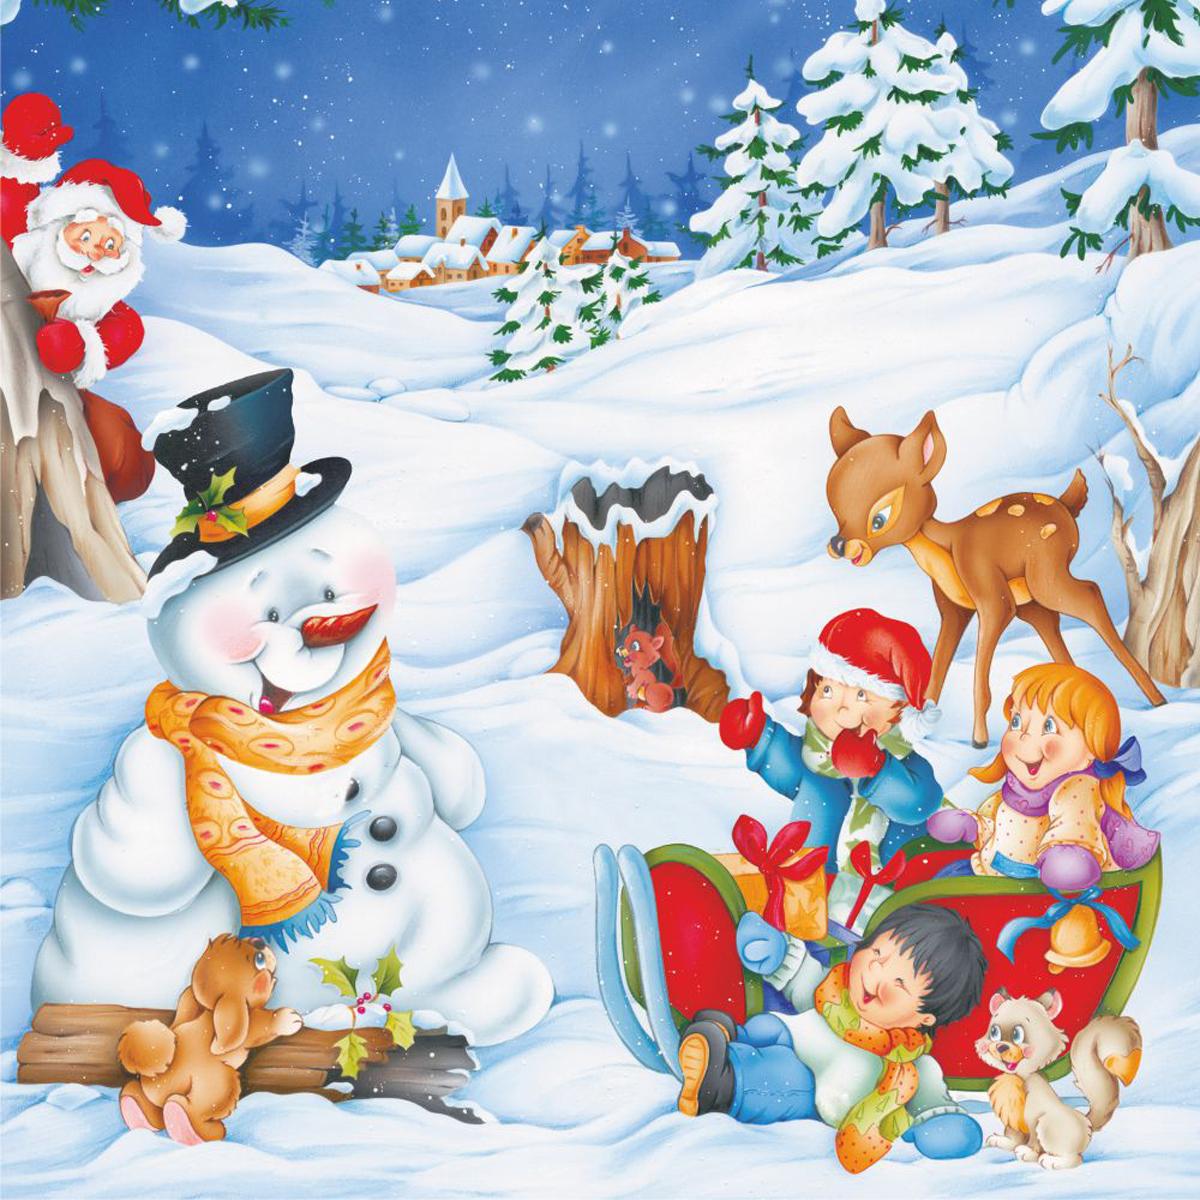 Snowman Kids Cartoon Snowman Jigsaw Puzzle